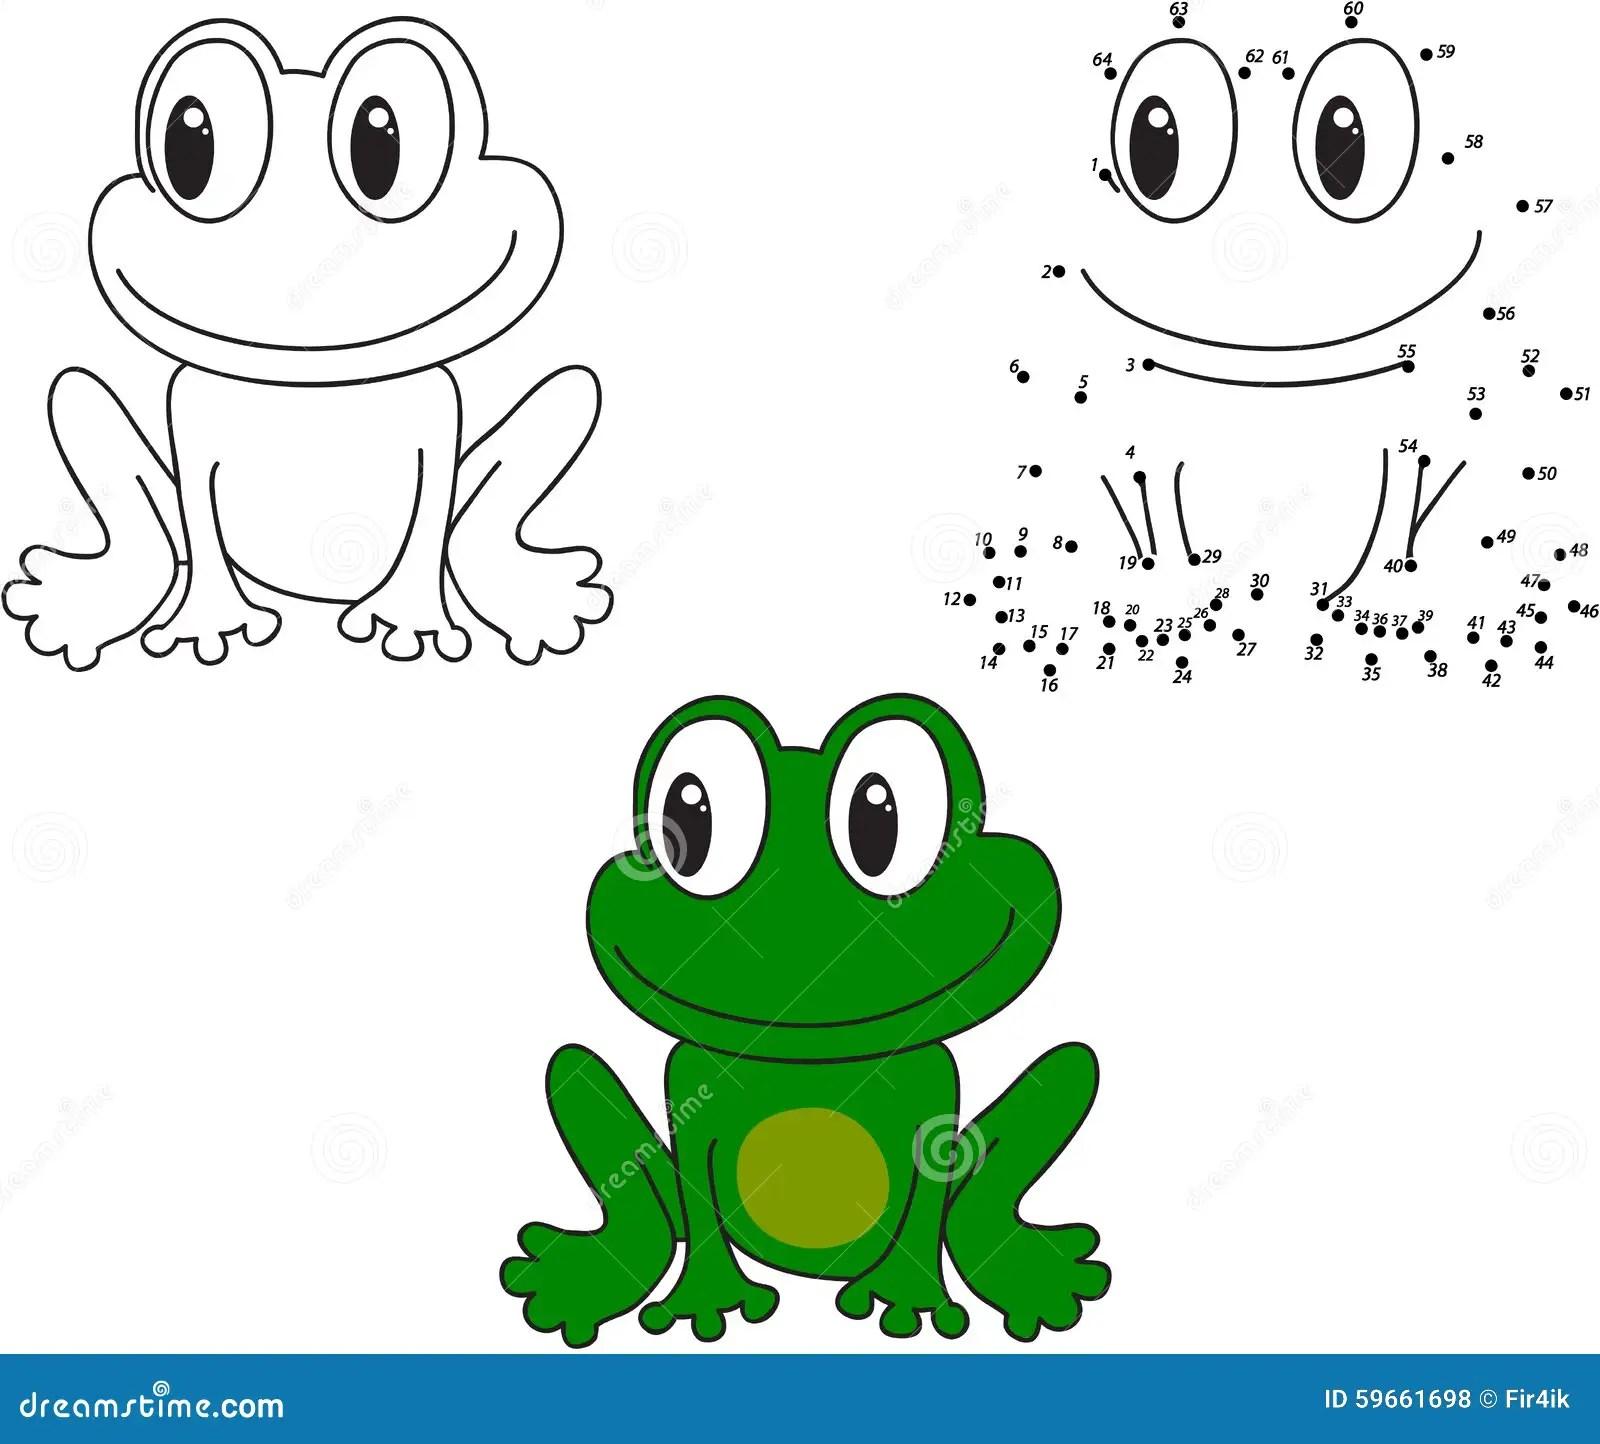 Cartoon Frog Vector Illustration Coloring And Dot To Dot